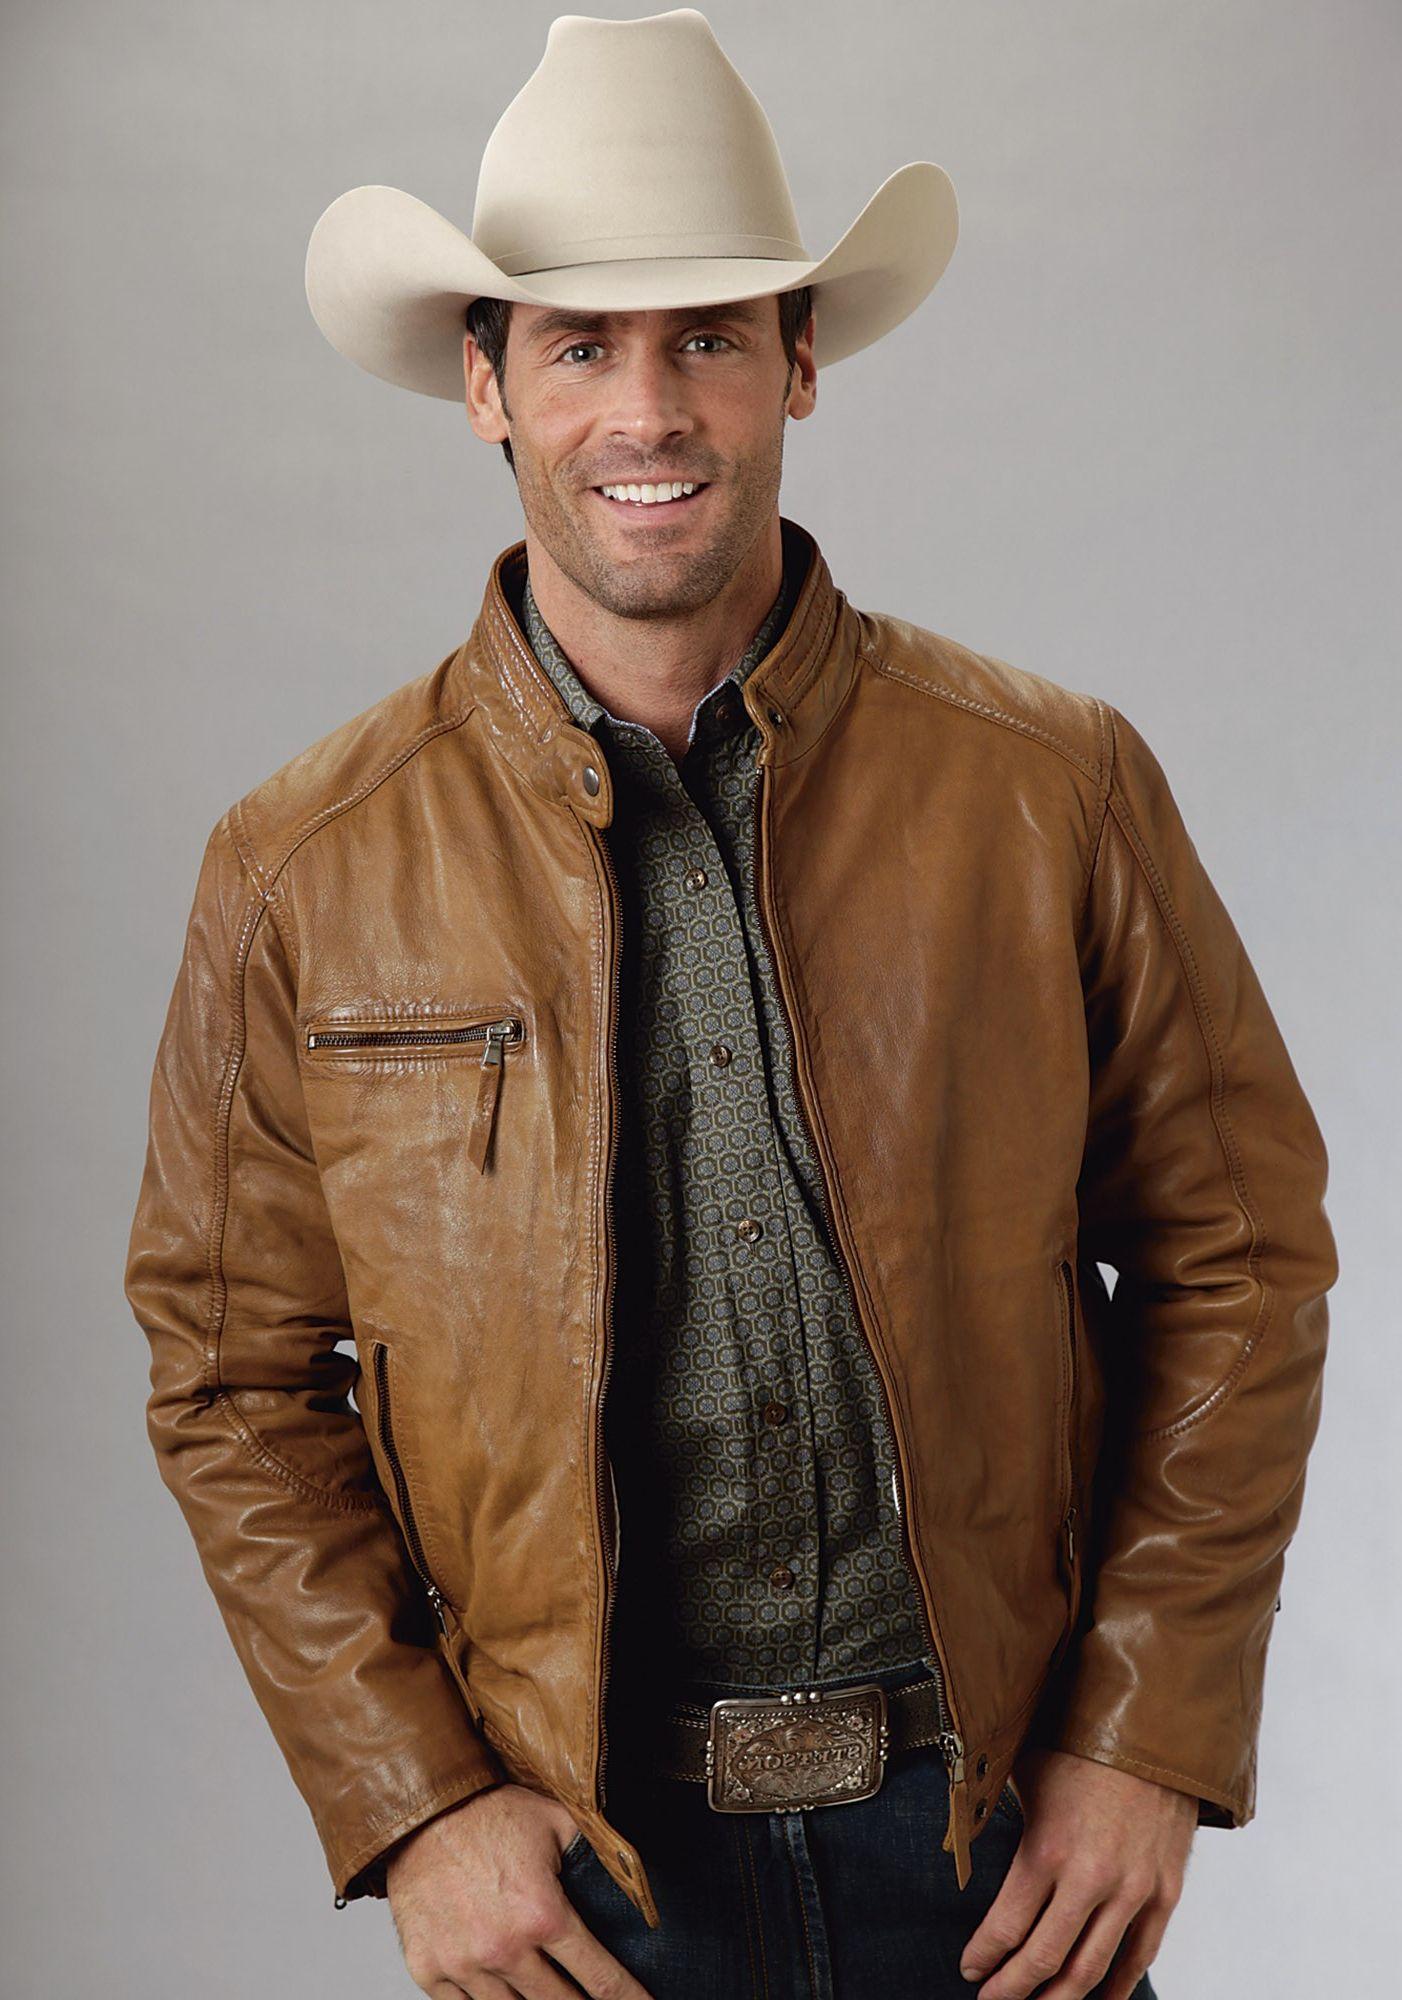 7997b9603706 Men s Leather Cowboy Jackets   Clothing Catalog   Pinterest